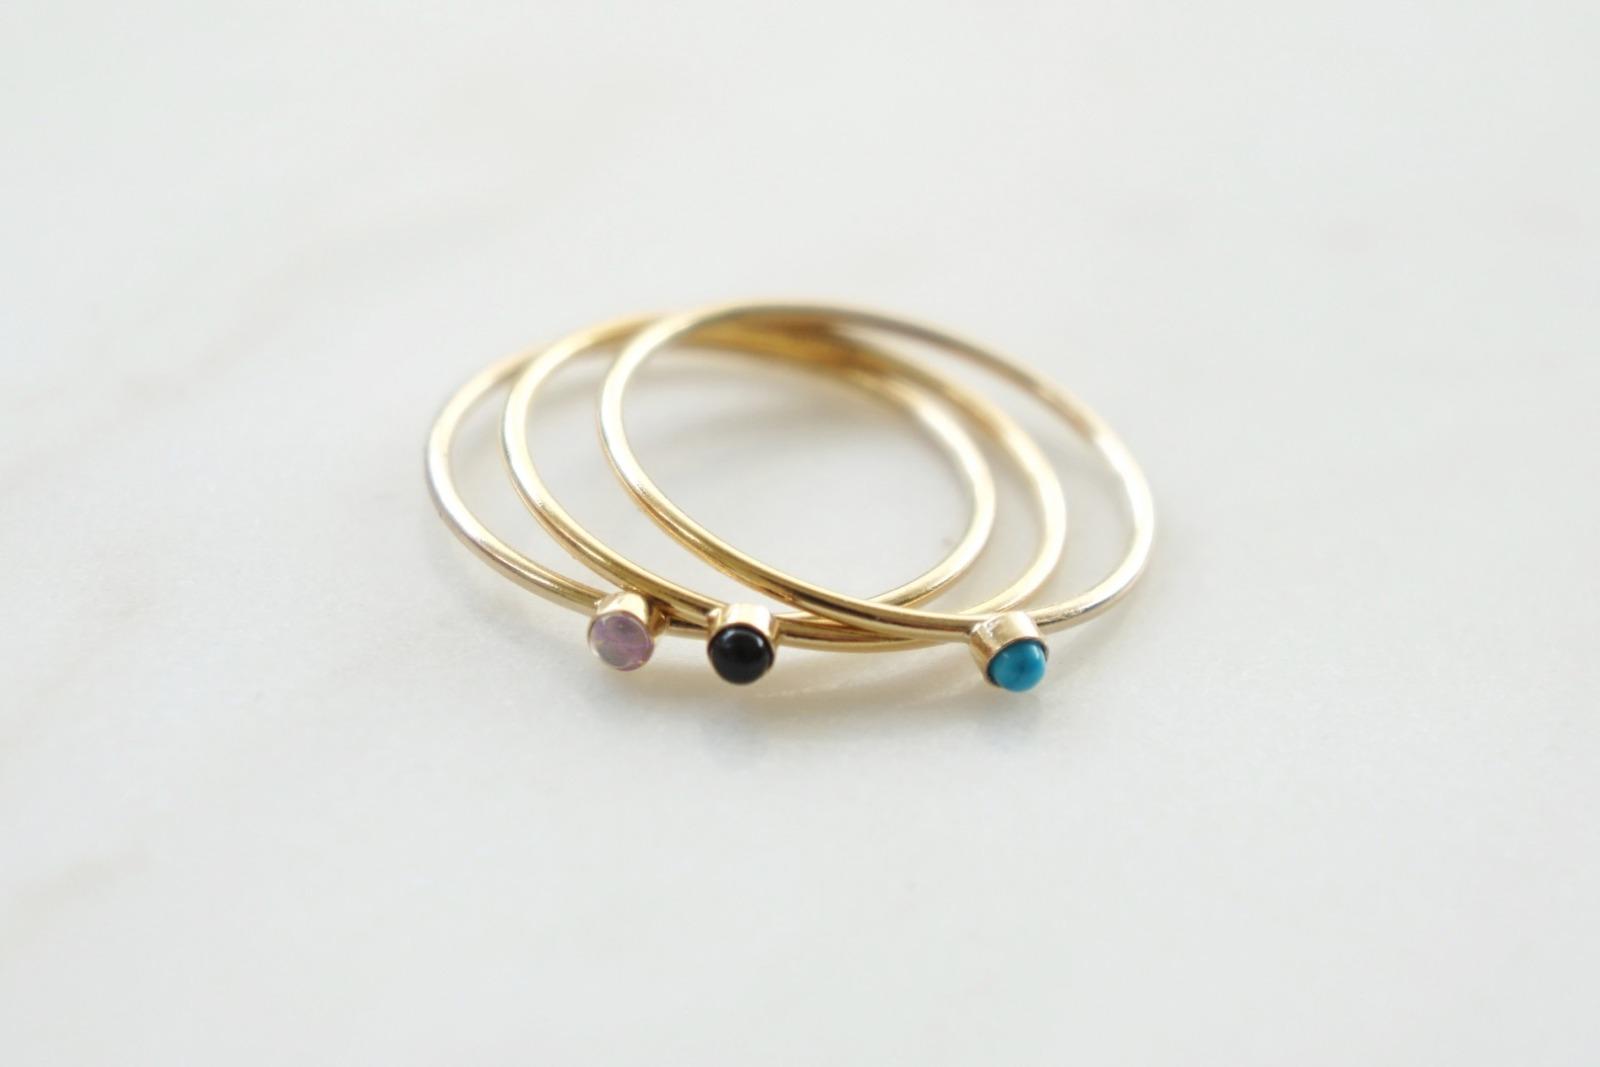 Zierlicher Ring Stapelring vergoldet Rosa Opal - 2